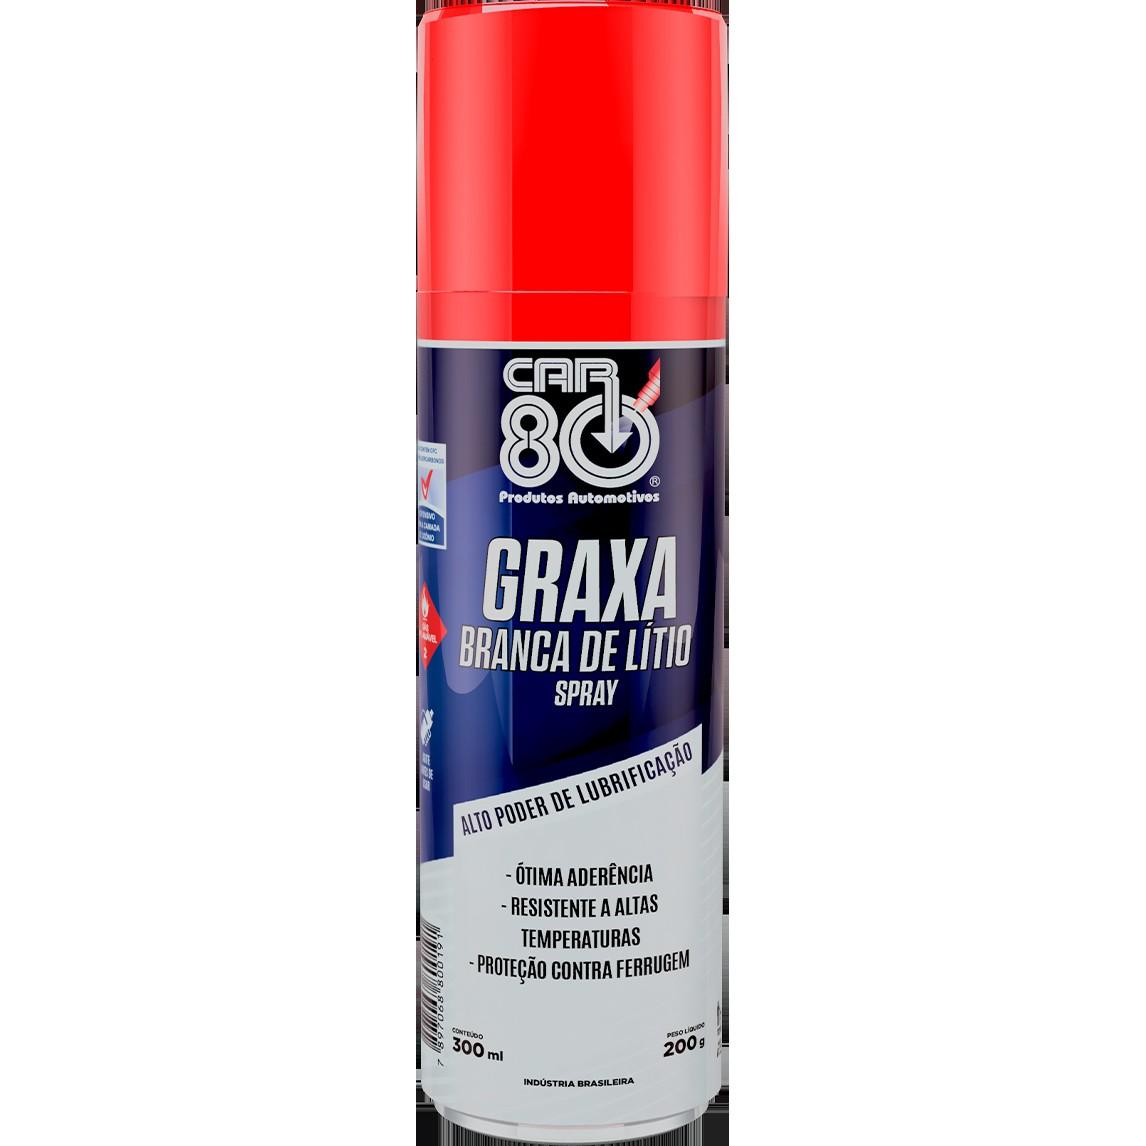 Graxa Branca de Litio em Spray 300 ml - Snap On